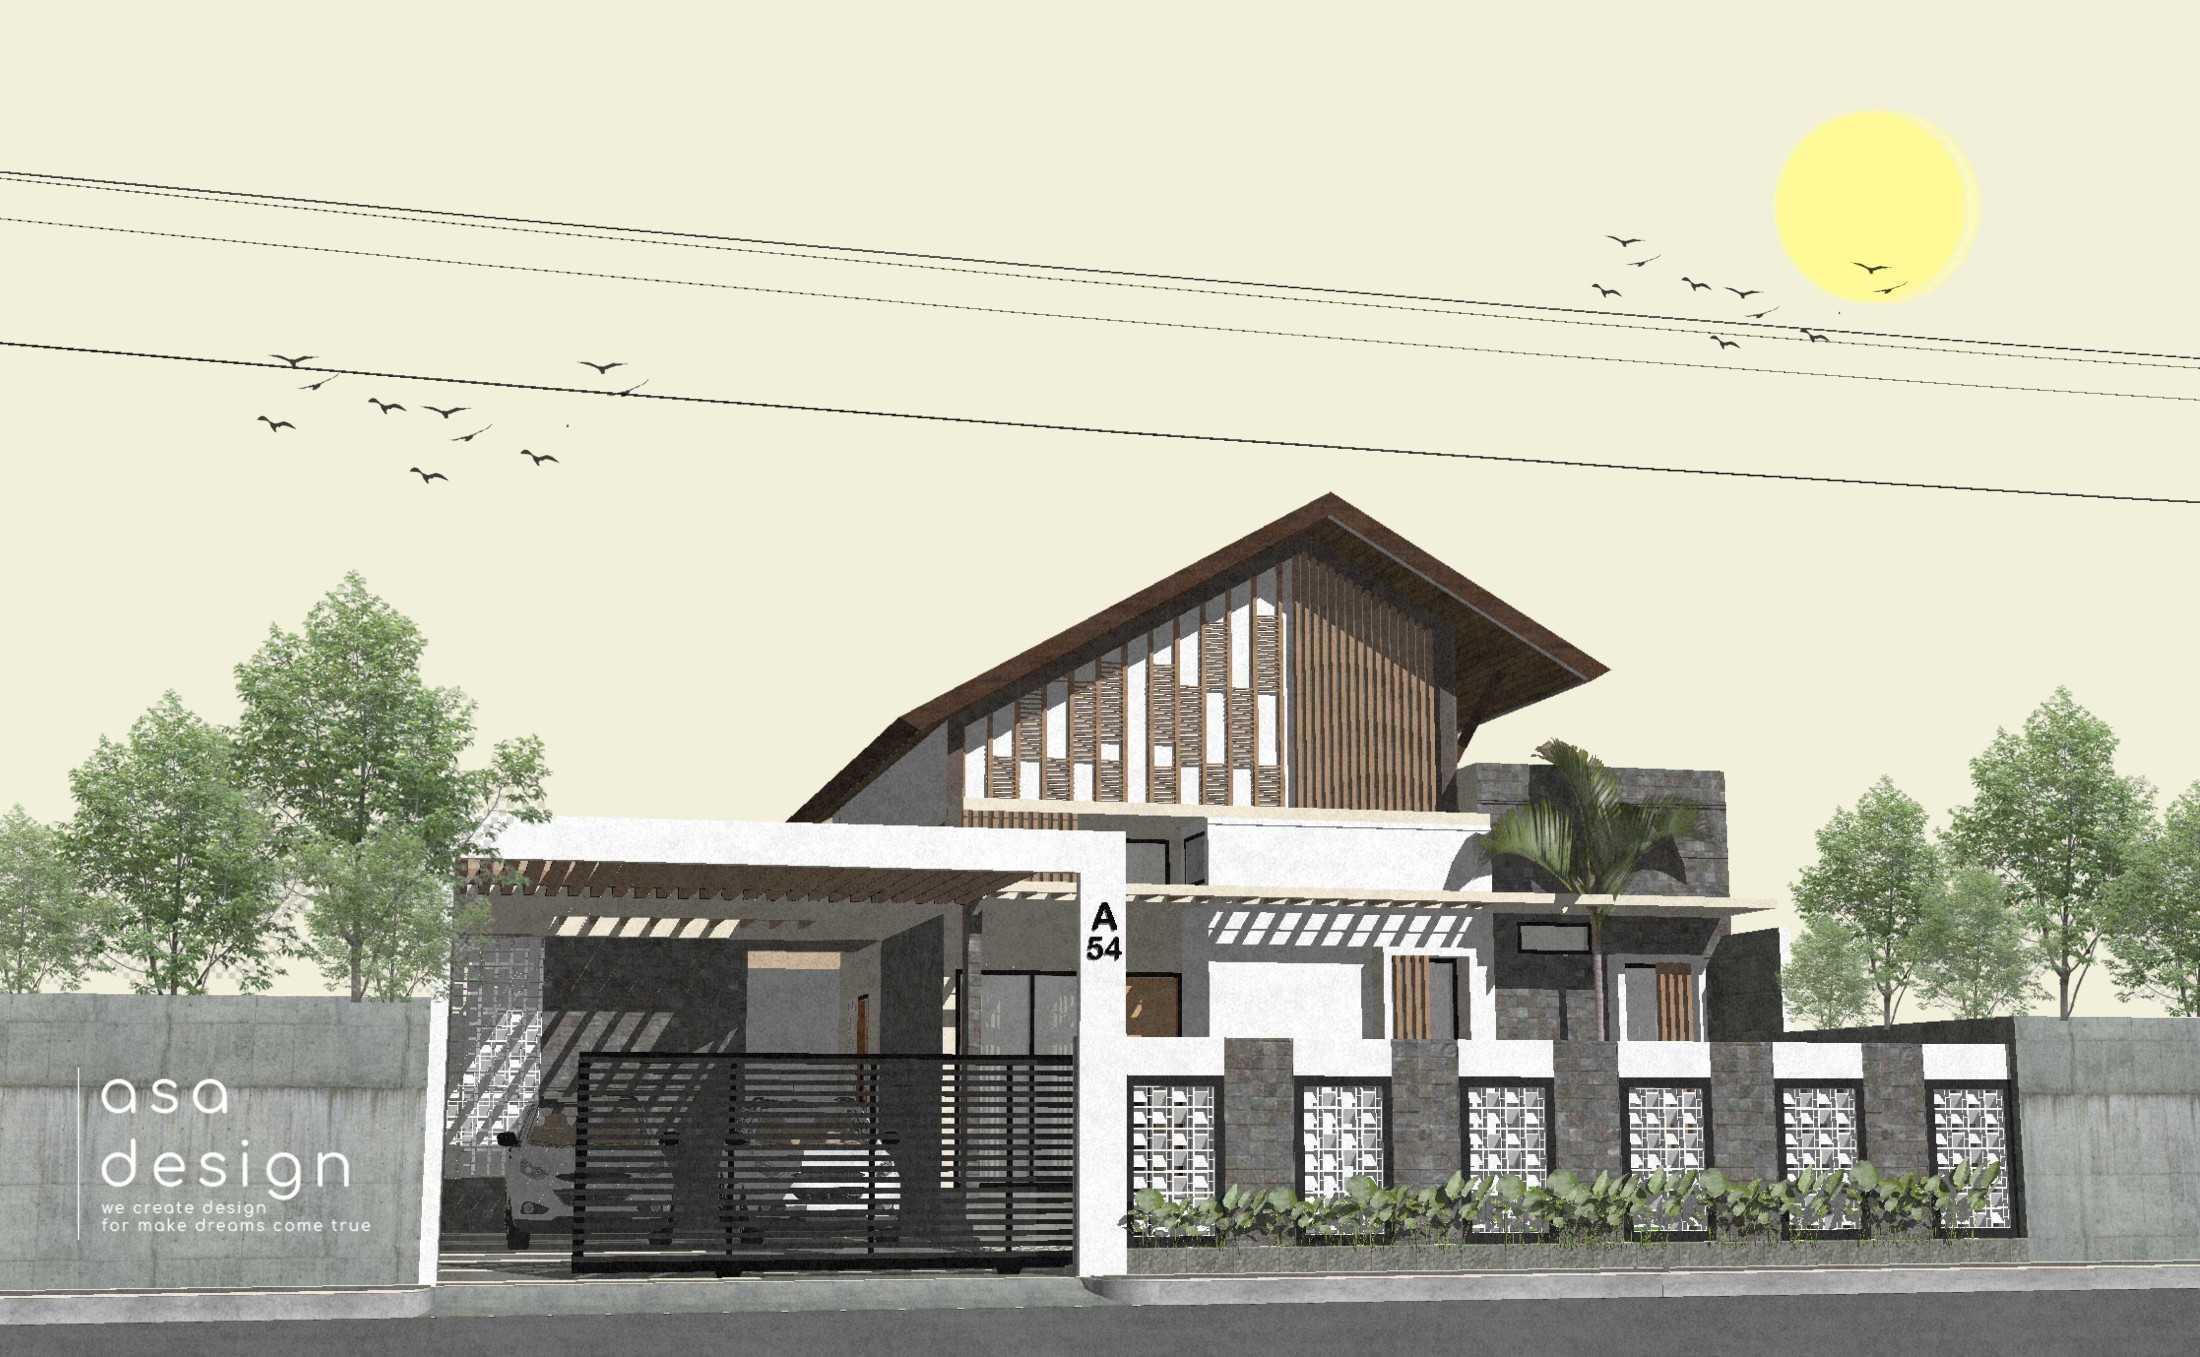 Asa Design Architect Griya Atap Miring Kediri, Jawa Timur, Indonesia Kediri, Jawa Timur, Indonesia Asa-Desain-Arsitek-Griya-Atap-Miring  125320